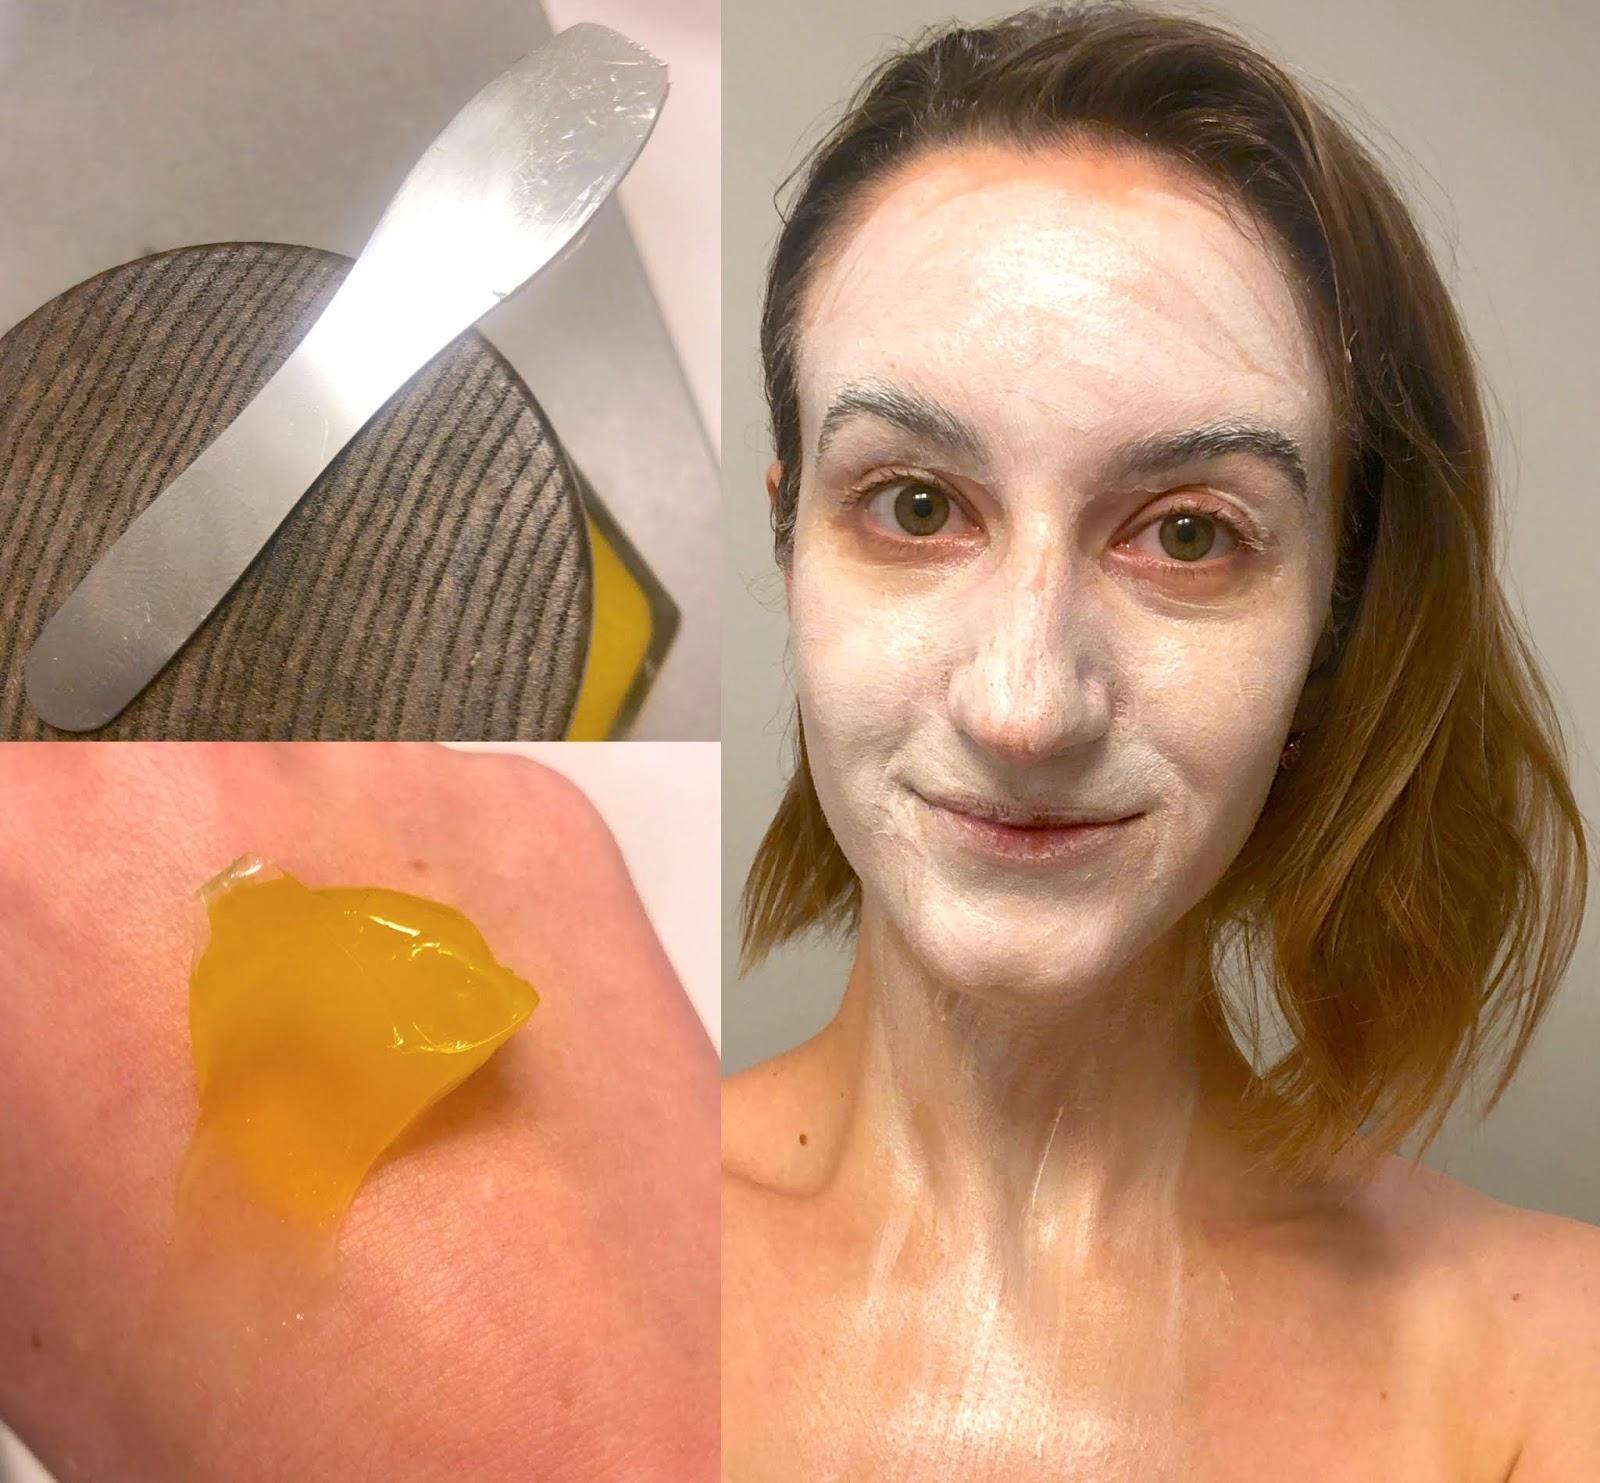 Farmacy Honey Potion Ingredients